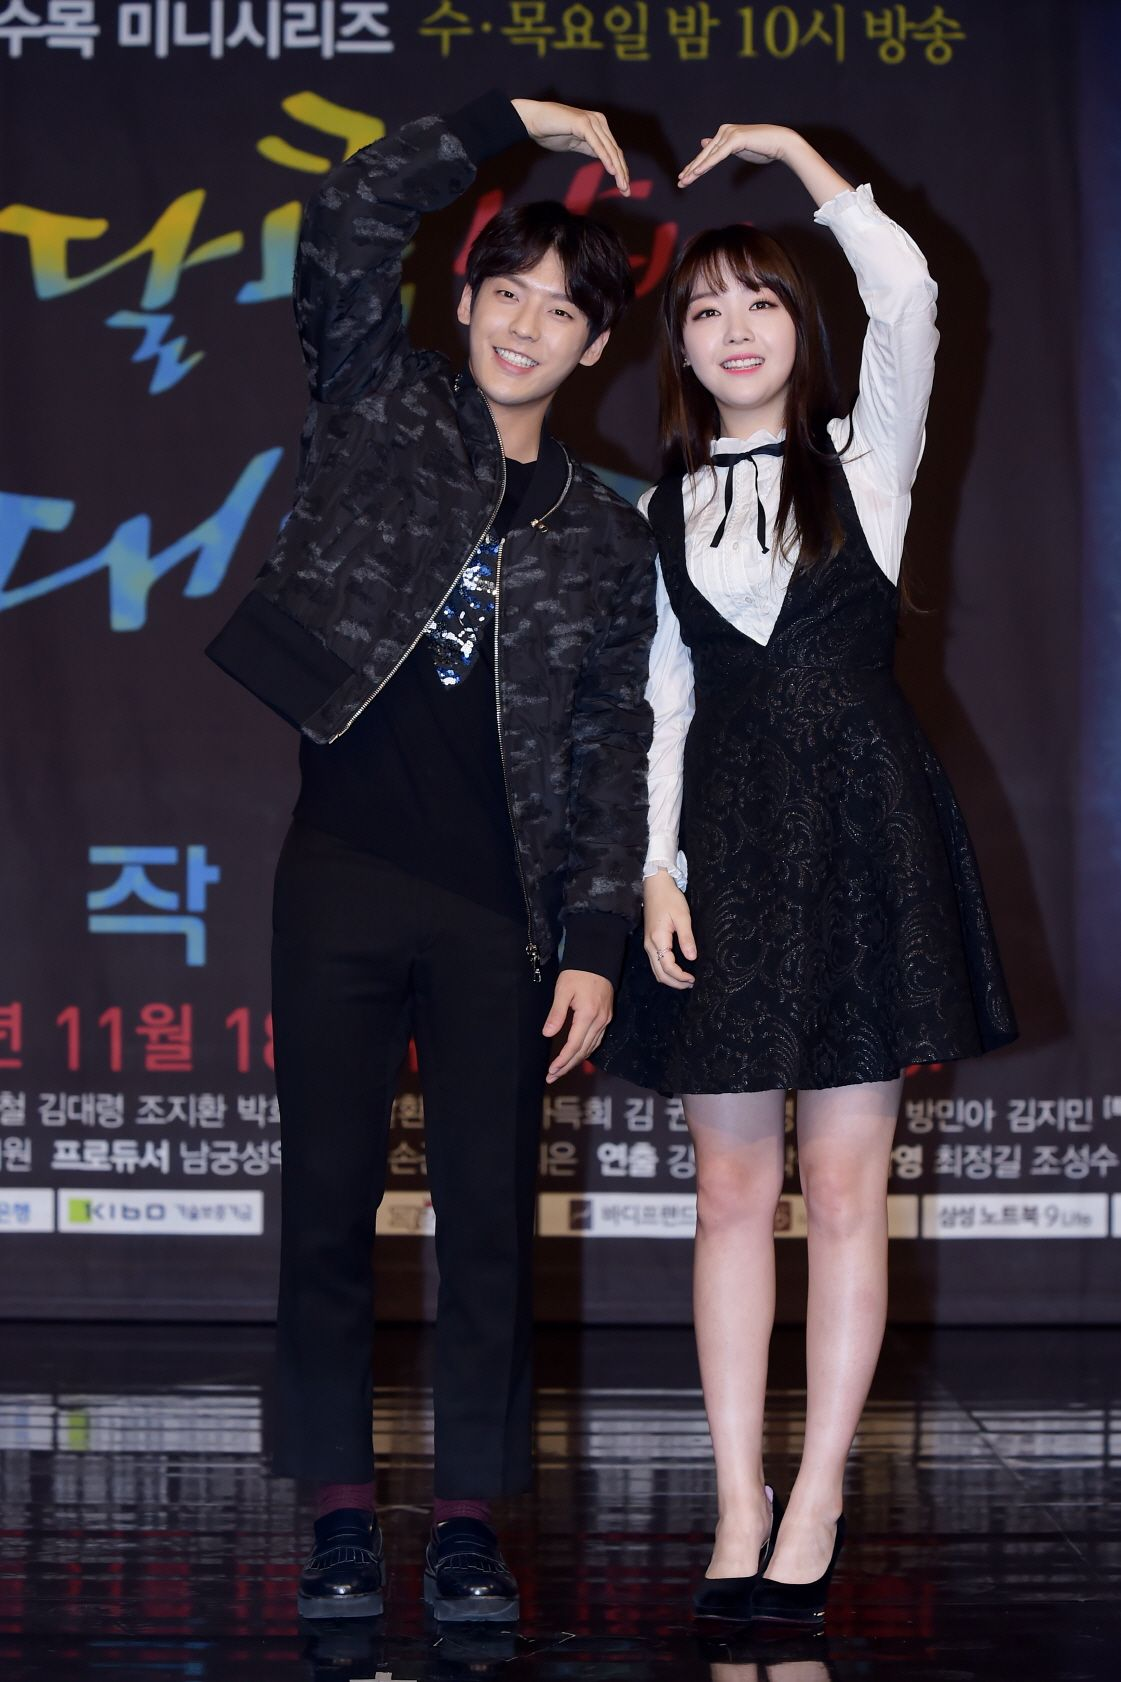 Minhyuk and minah dating after divorce